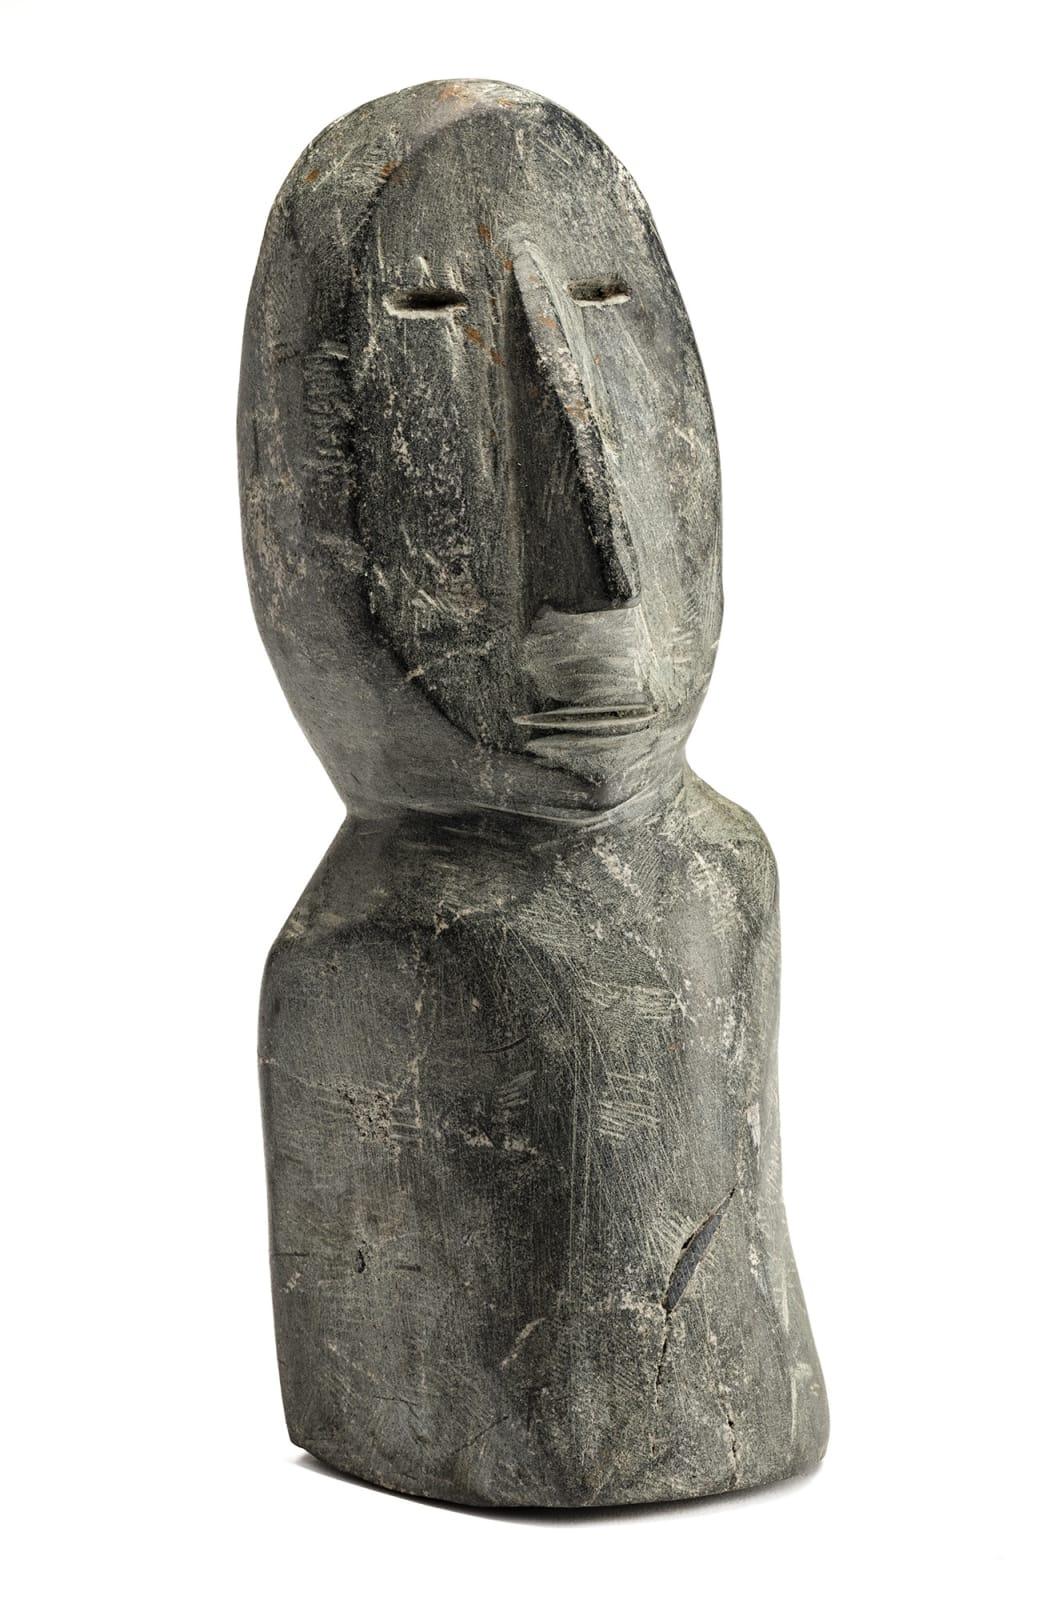 Lot 116 UNIDENTIFIED ARTIST, ARVIAT (ESKIMO POINT) Bust, c. early 1980s stone, 10 x 4 x 3.75 in (25.4 x 10.2 x 9.5 cm) Estimate: $900— $1,200 Price realized: $900